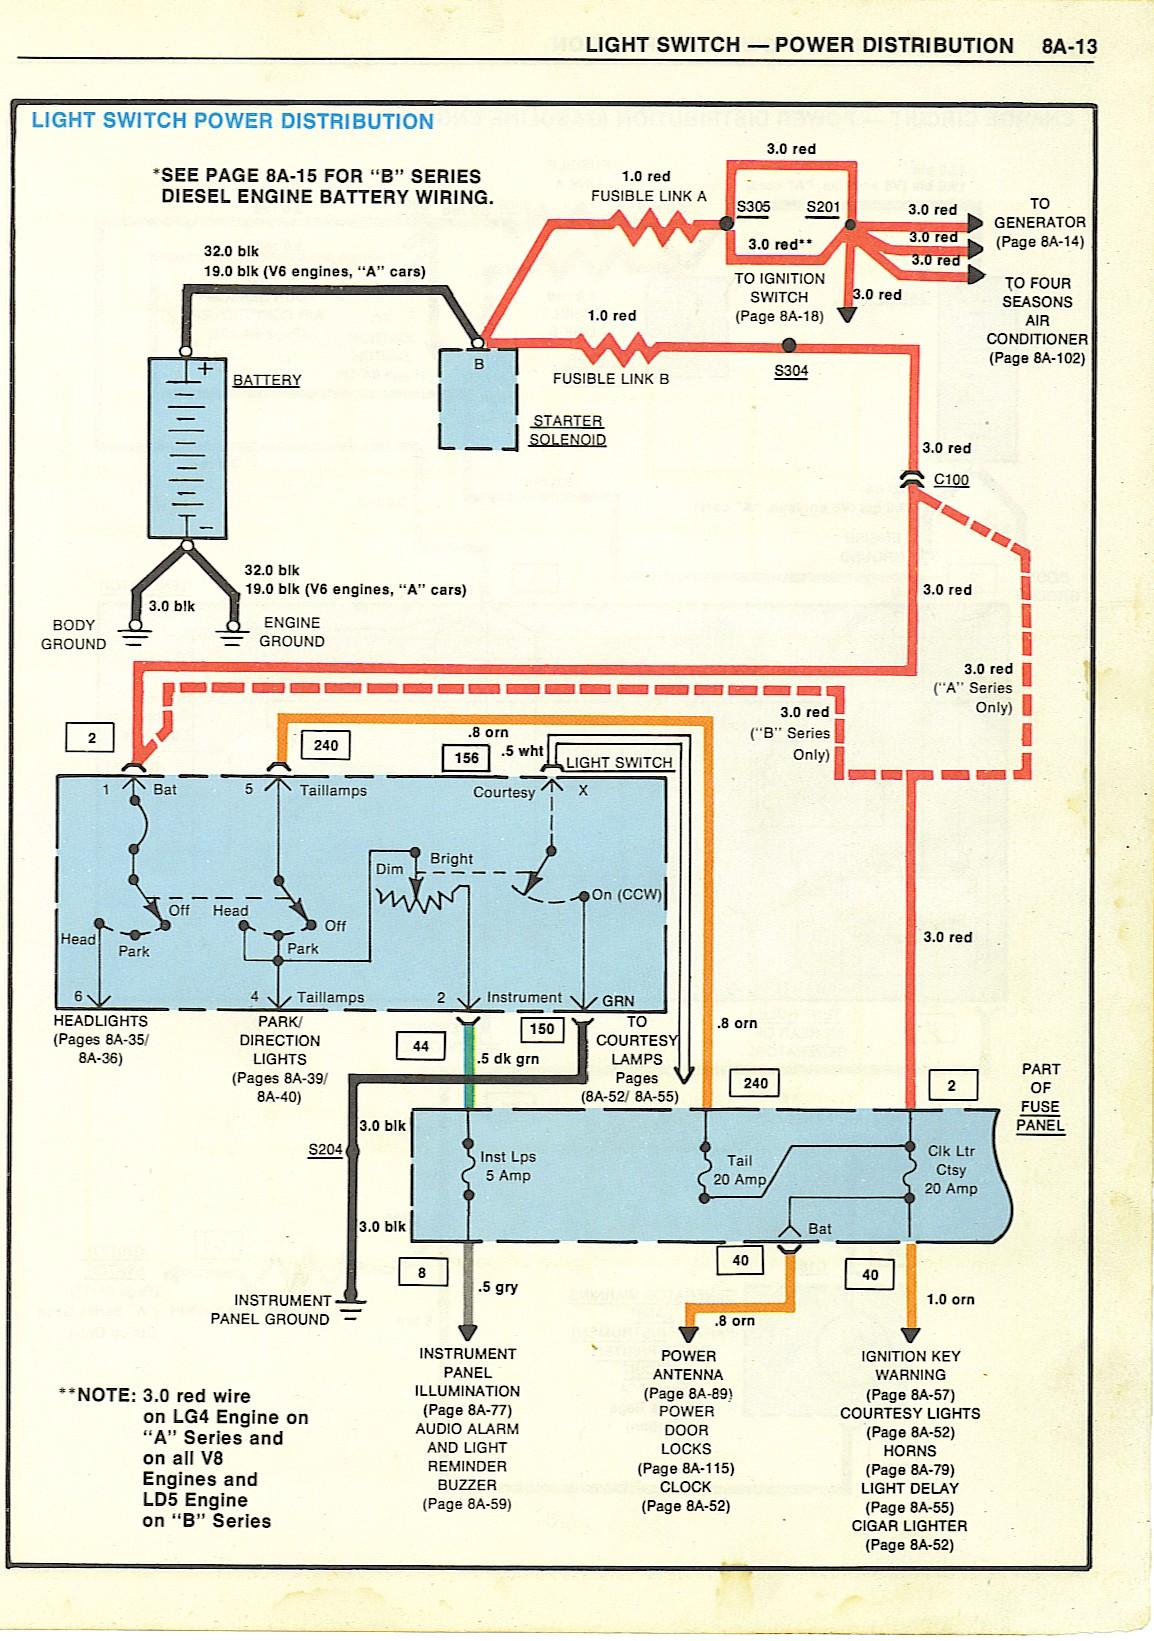 Jeep CJ7 Light Switch Wiring Diagram image details – Light Switch Wire Diagram For Cj7